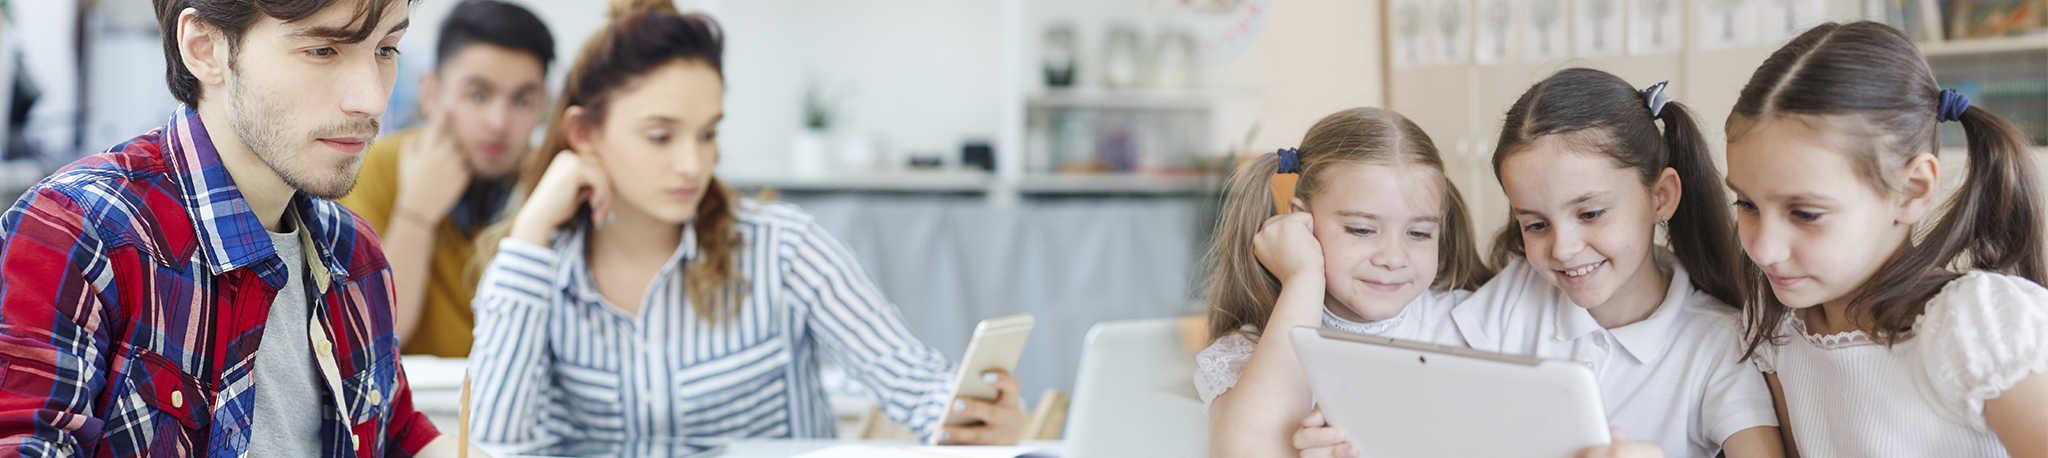 Online Spanish Lessons for Kids - Easy Español